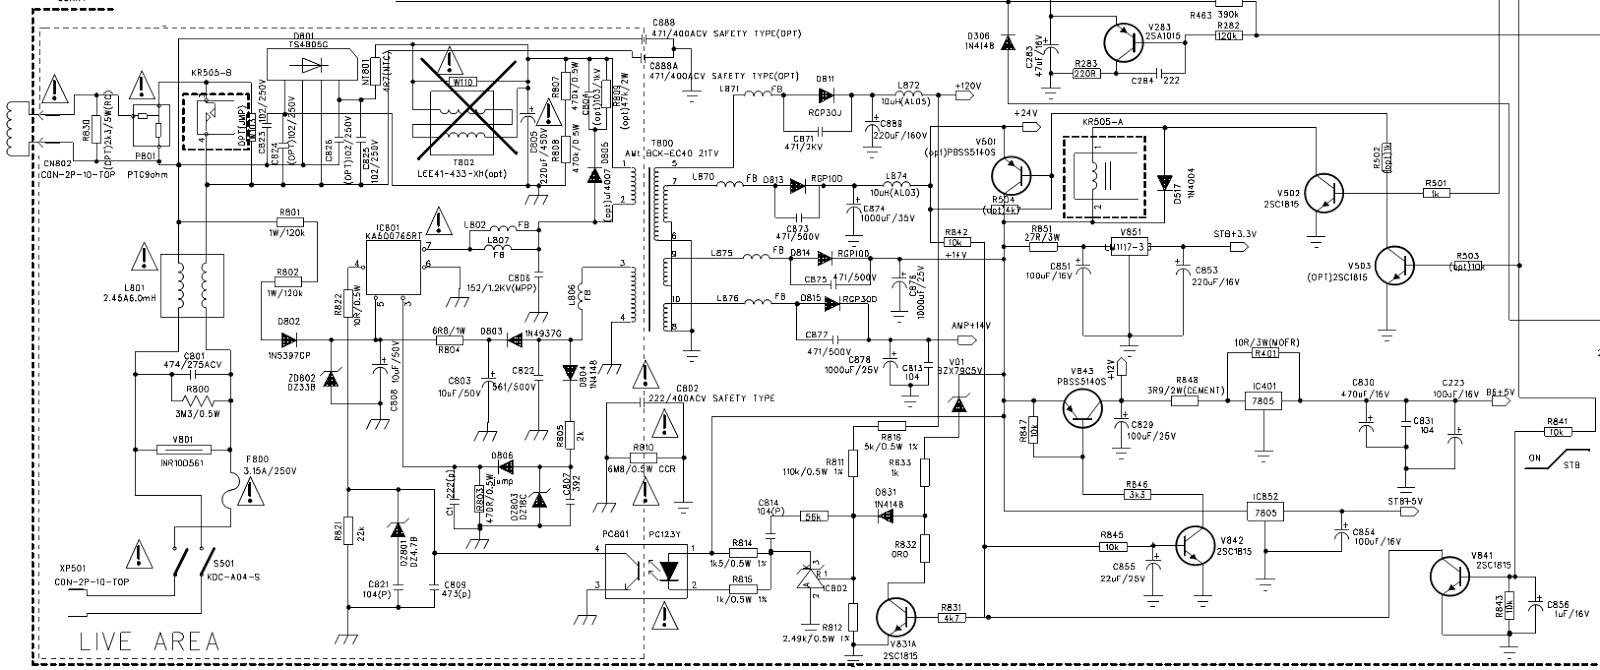 Videocon Crt Tv Power Supply Circuit Diagram | Diagram